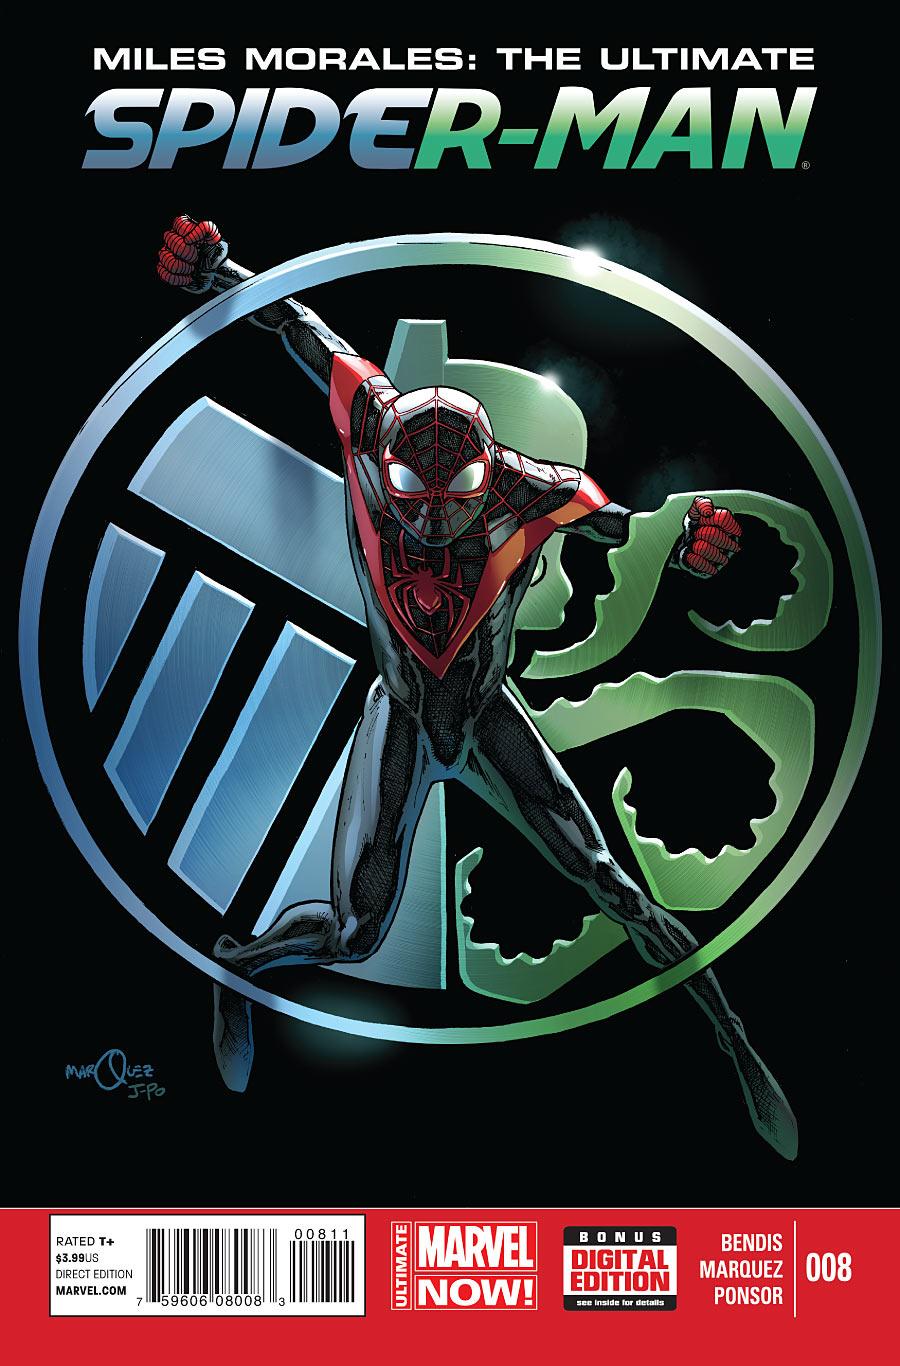 Miles Morales: Ultimate Spider-Man Vol 1 8